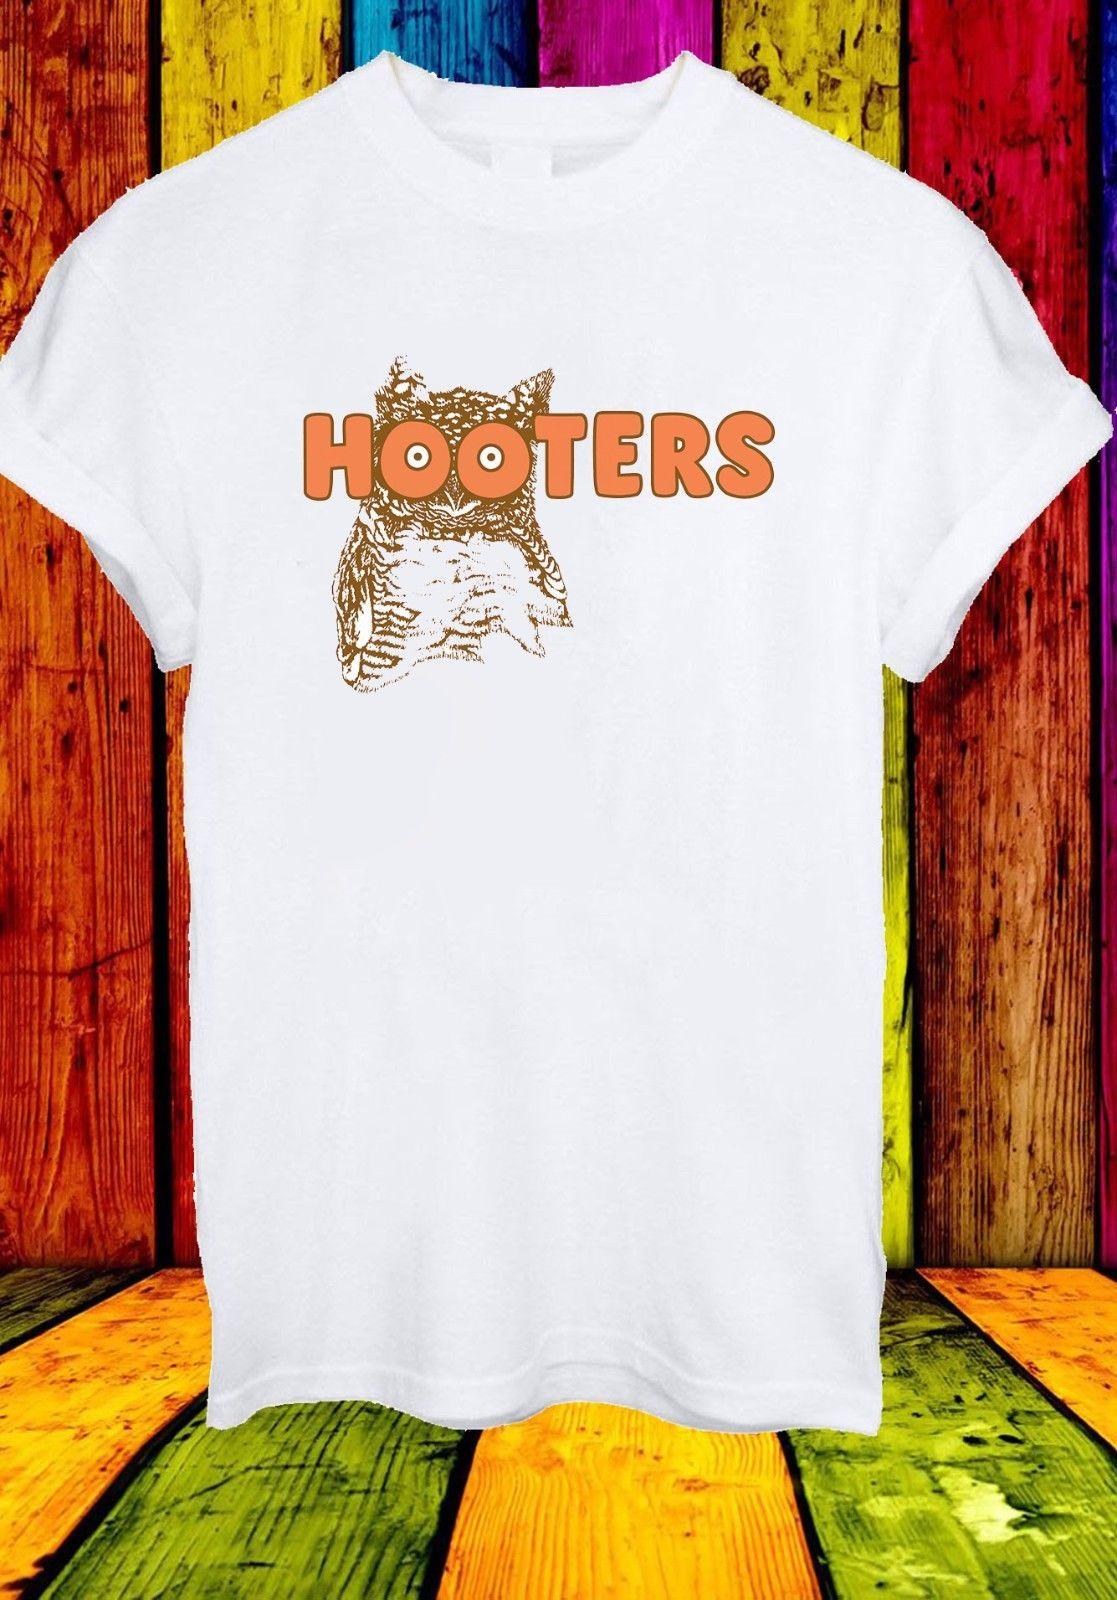 cbdd8ad85 Hooters Owl Boobs America Usa Waitress Bird Logo Men Women Unisex T Shirt  355 Cool Casual Pride T Shirt Men Unisex New T Shirt Slogans Dirty T Shirts  From ...